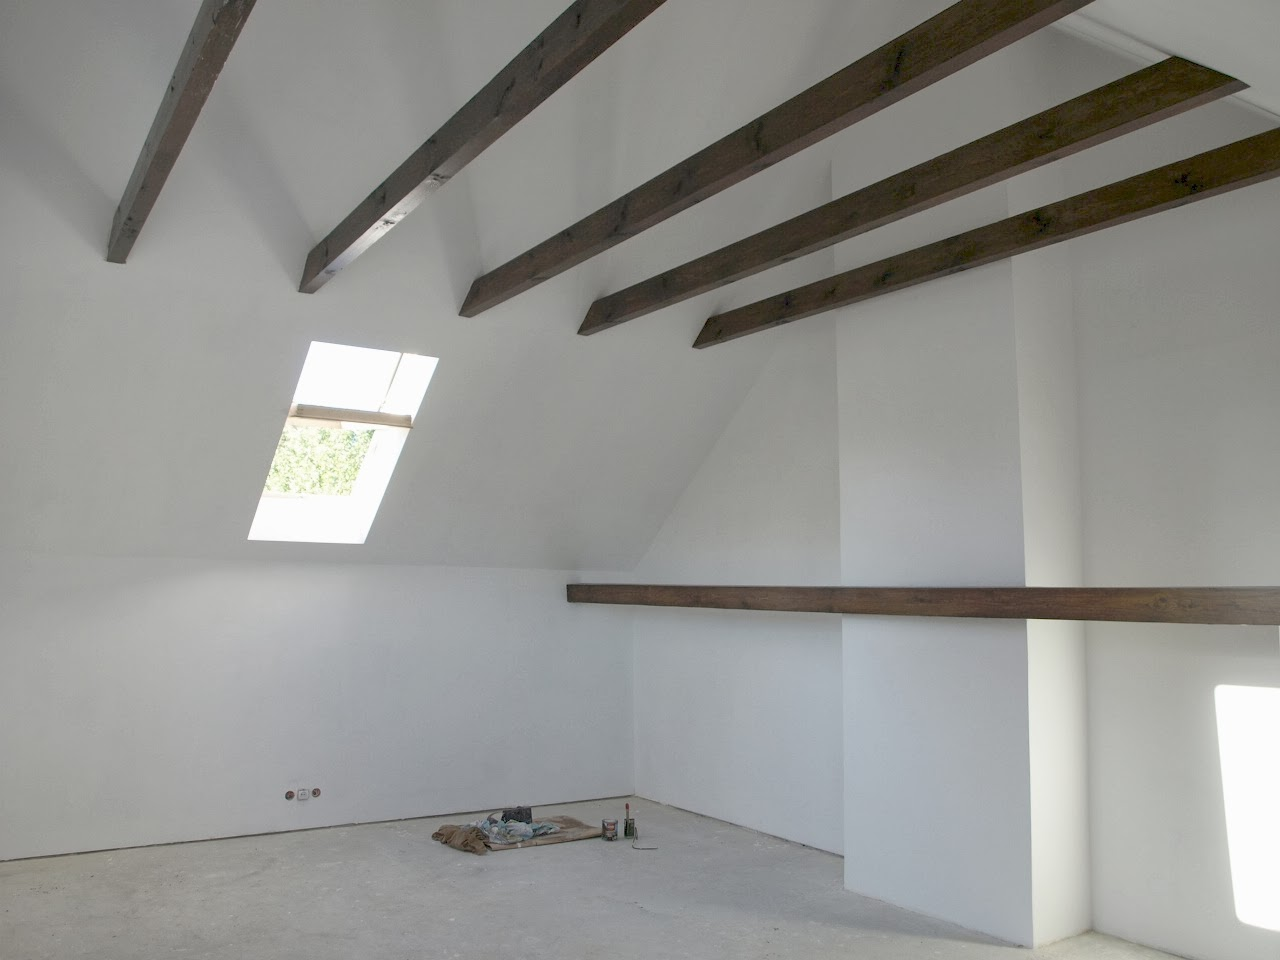 remont starego domu poddasze strop dach belki murator